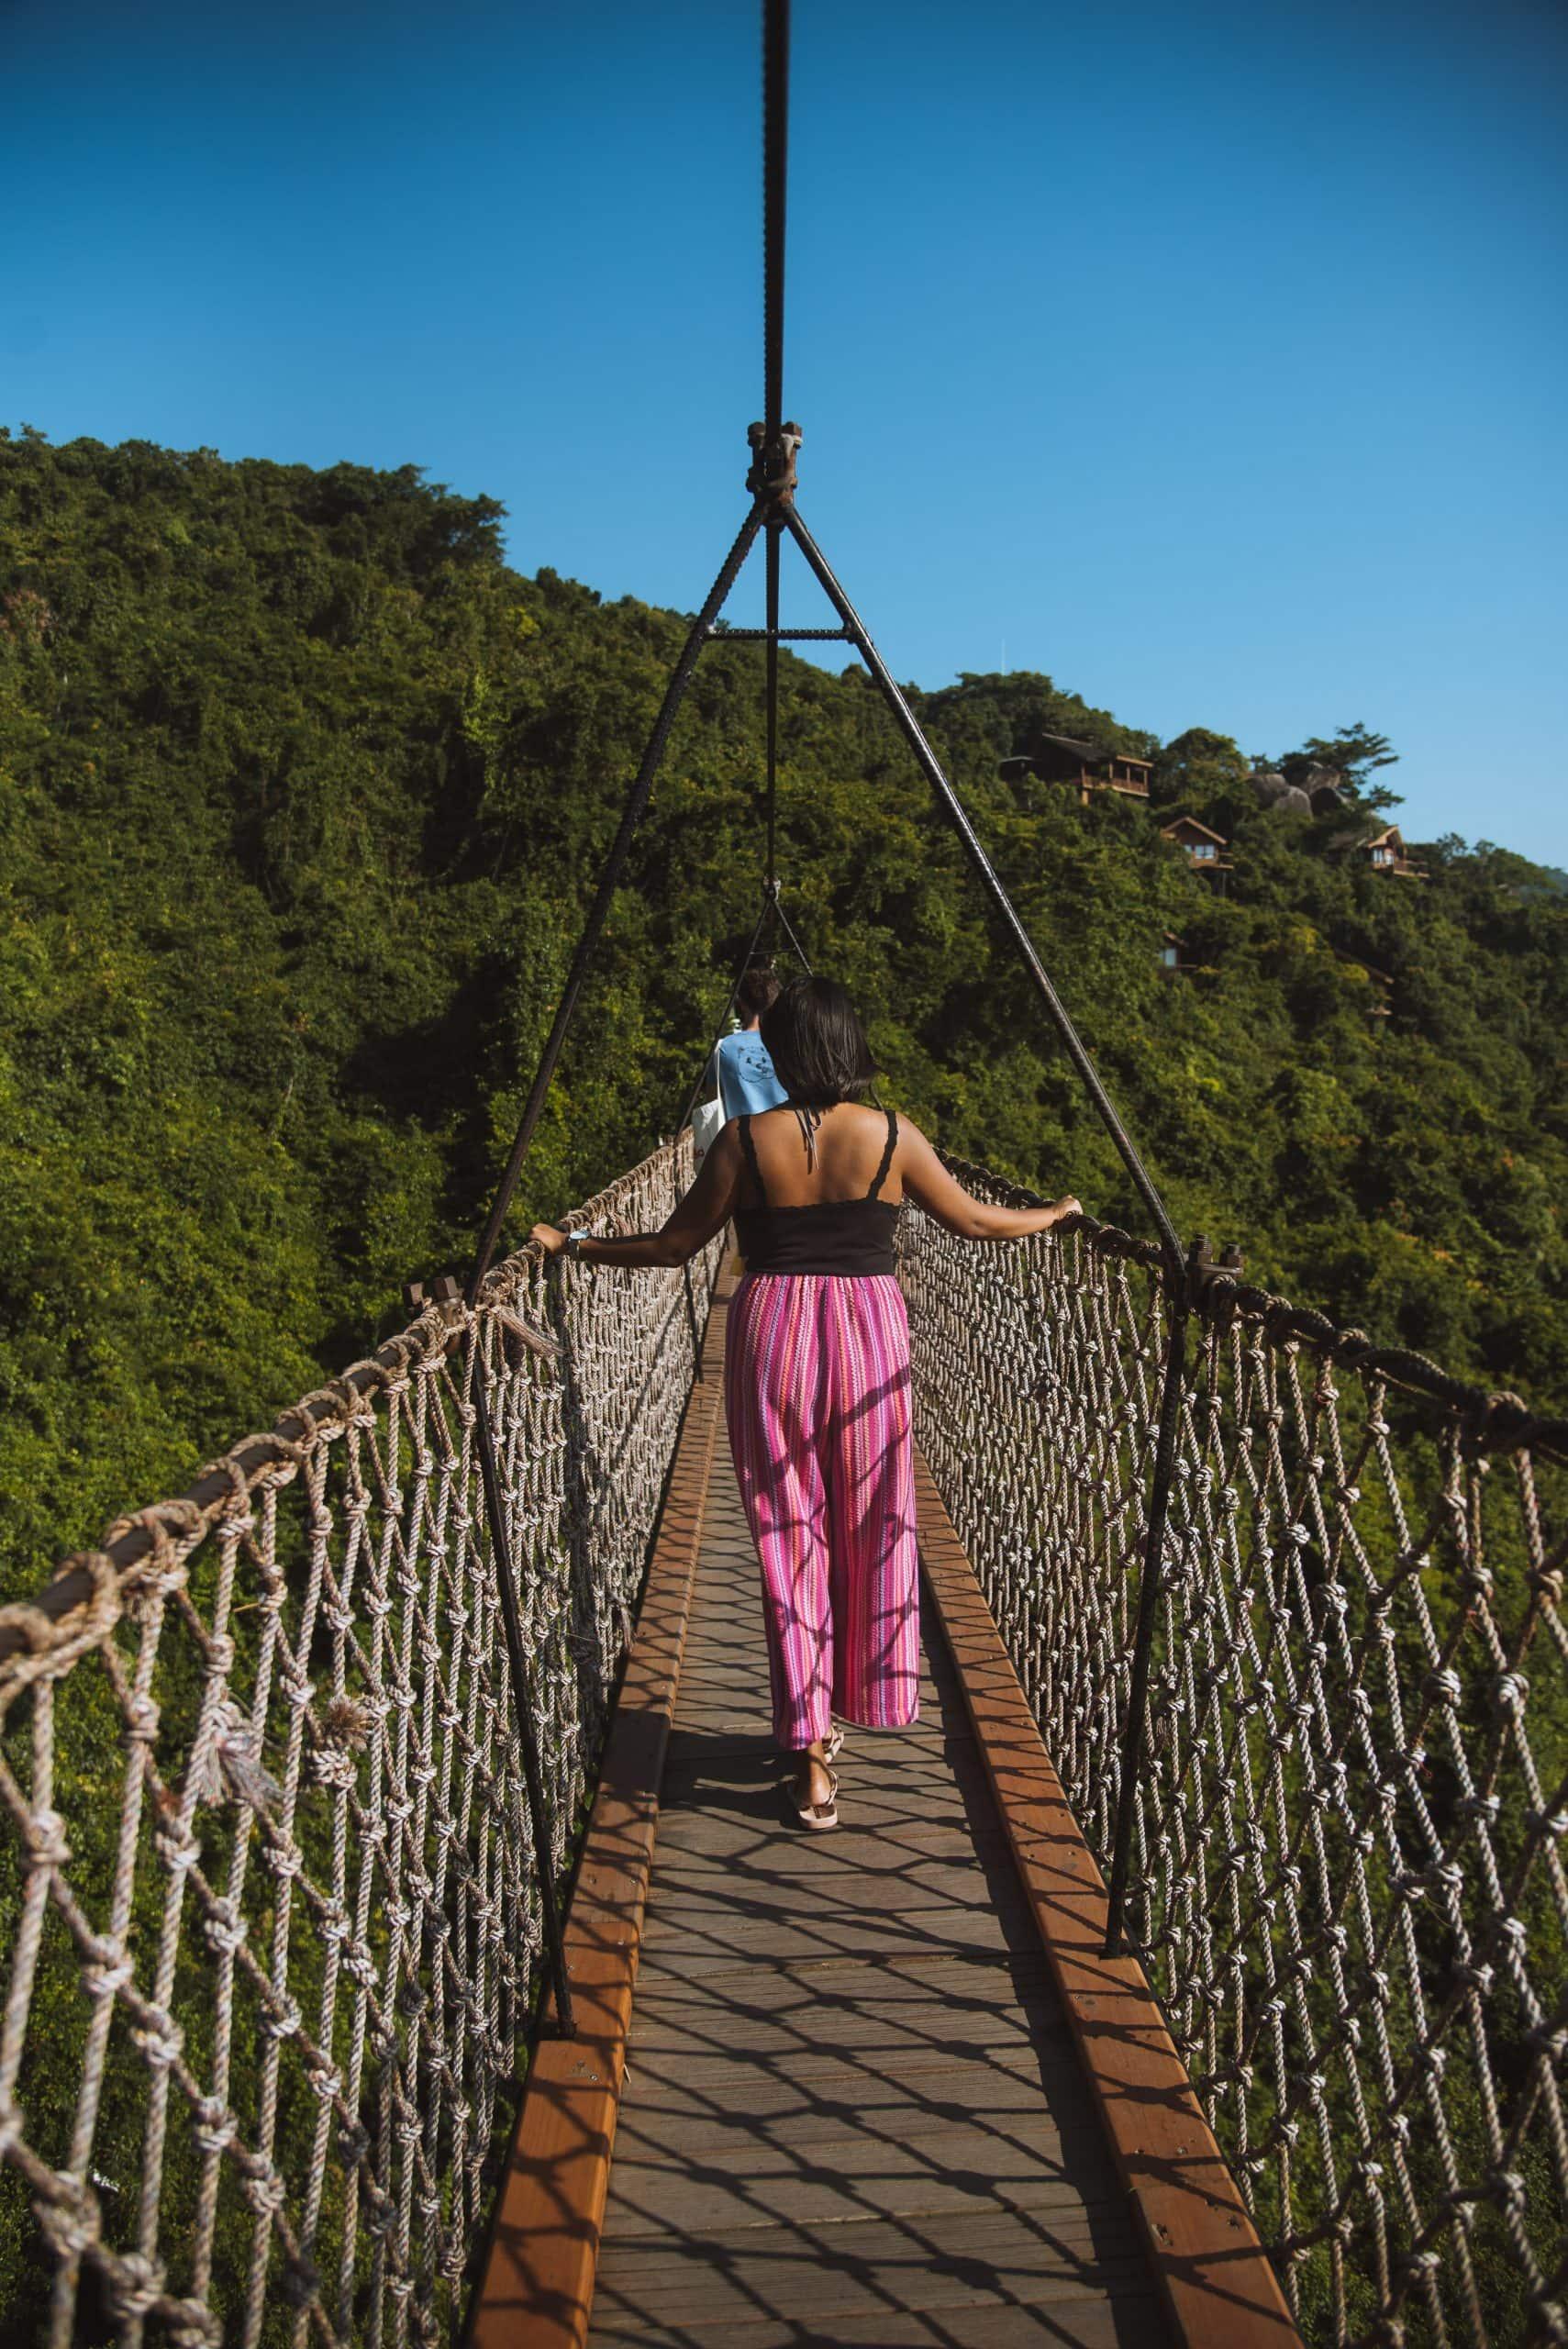 things to do in Sanya, Sanya travel guide, hanging bridge in Sanya